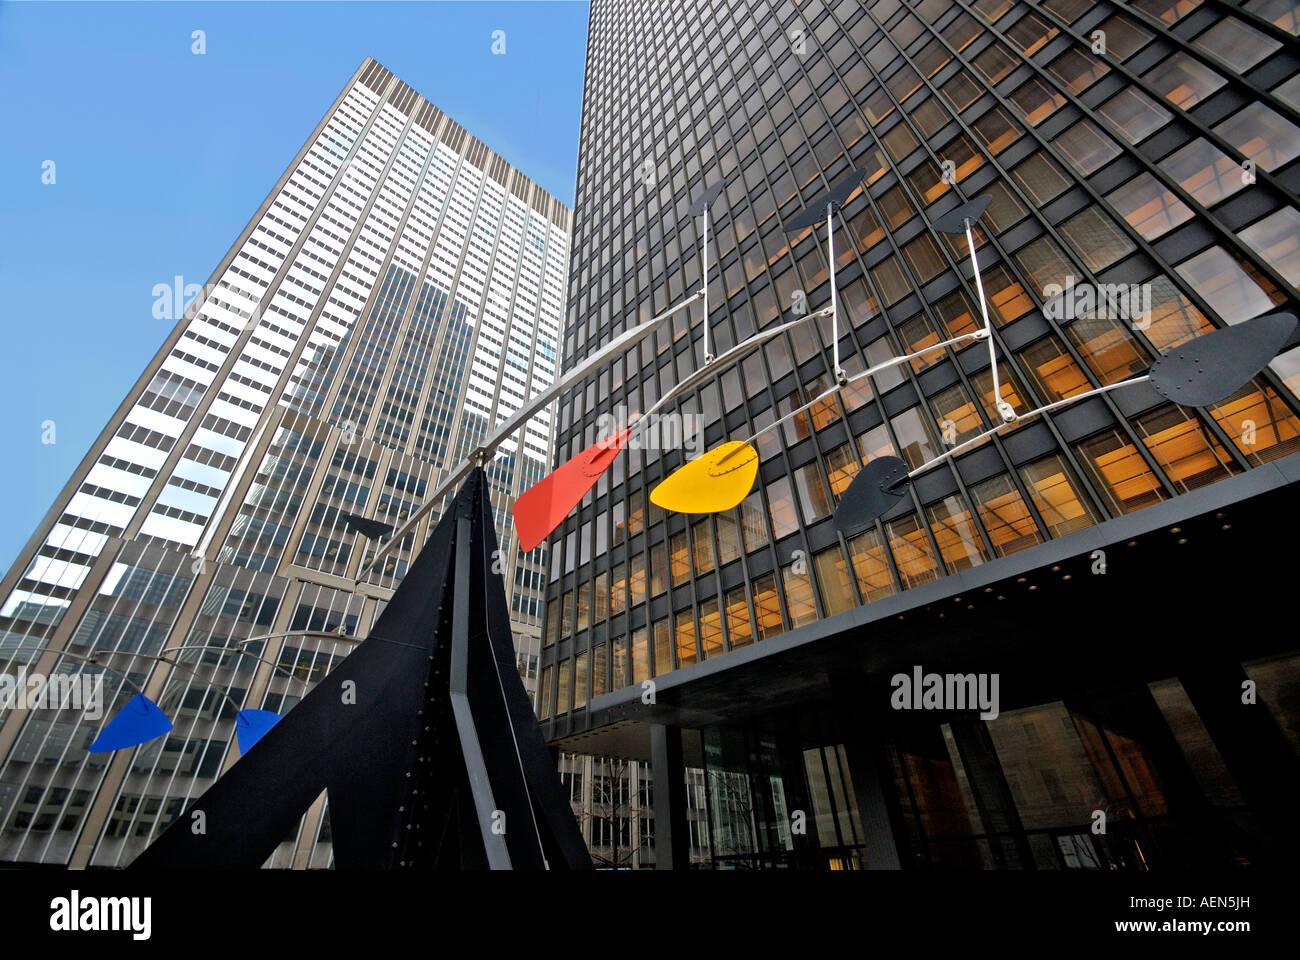 Calder at Lexington, Manhattan New York. - Stock Image